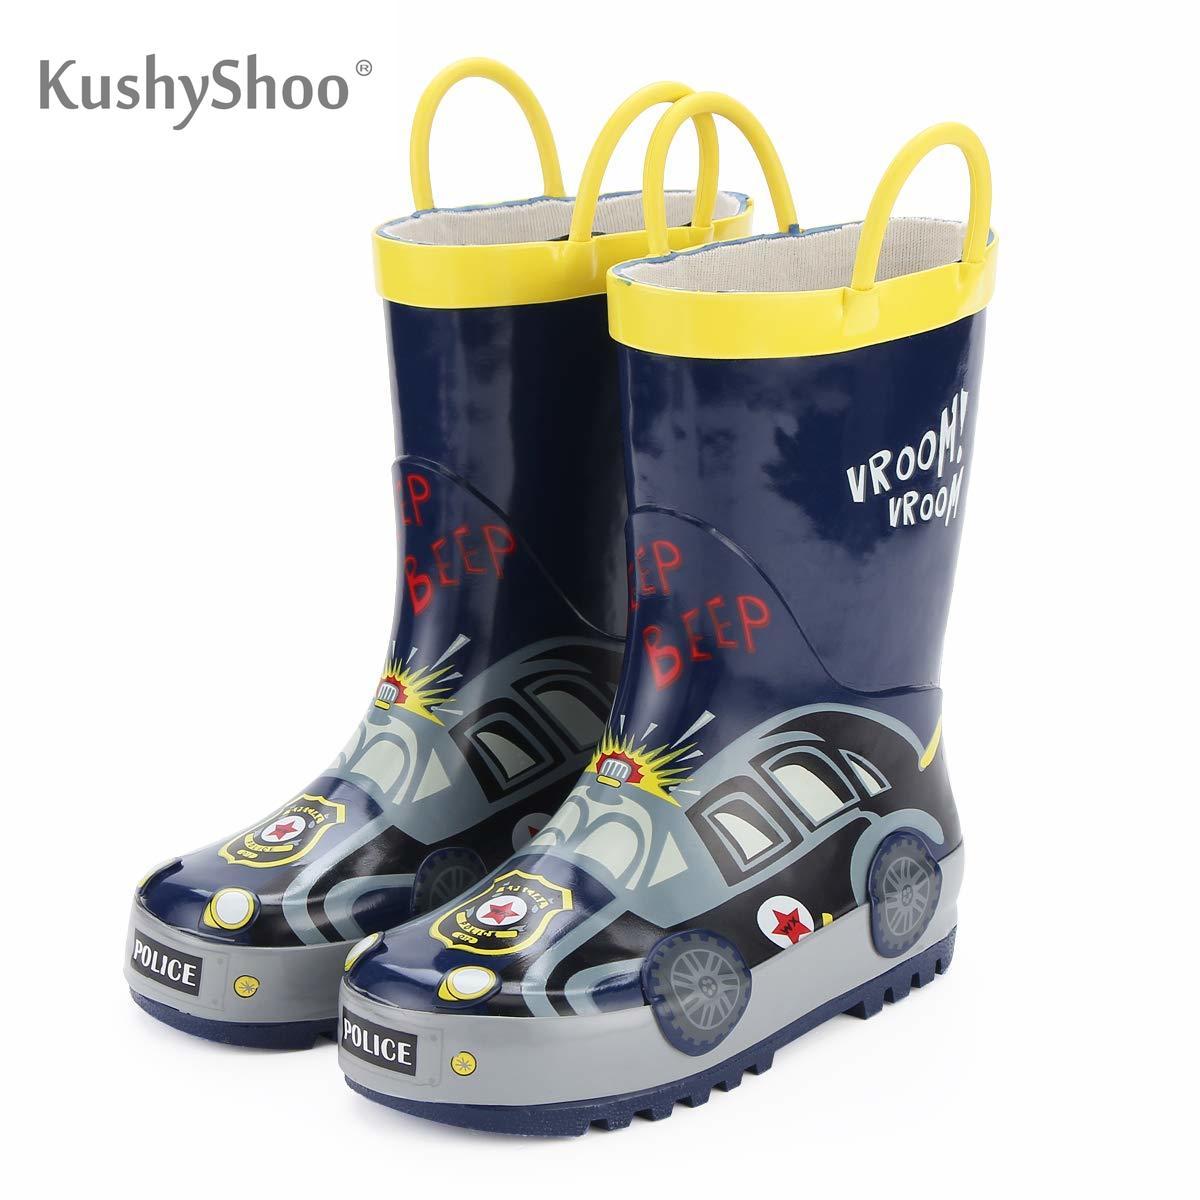 KushyShoo-أحذية المطر للأطفال ، أحذية المطر المقاومة للماء Loverly ، المطاط في الهواء الطلق